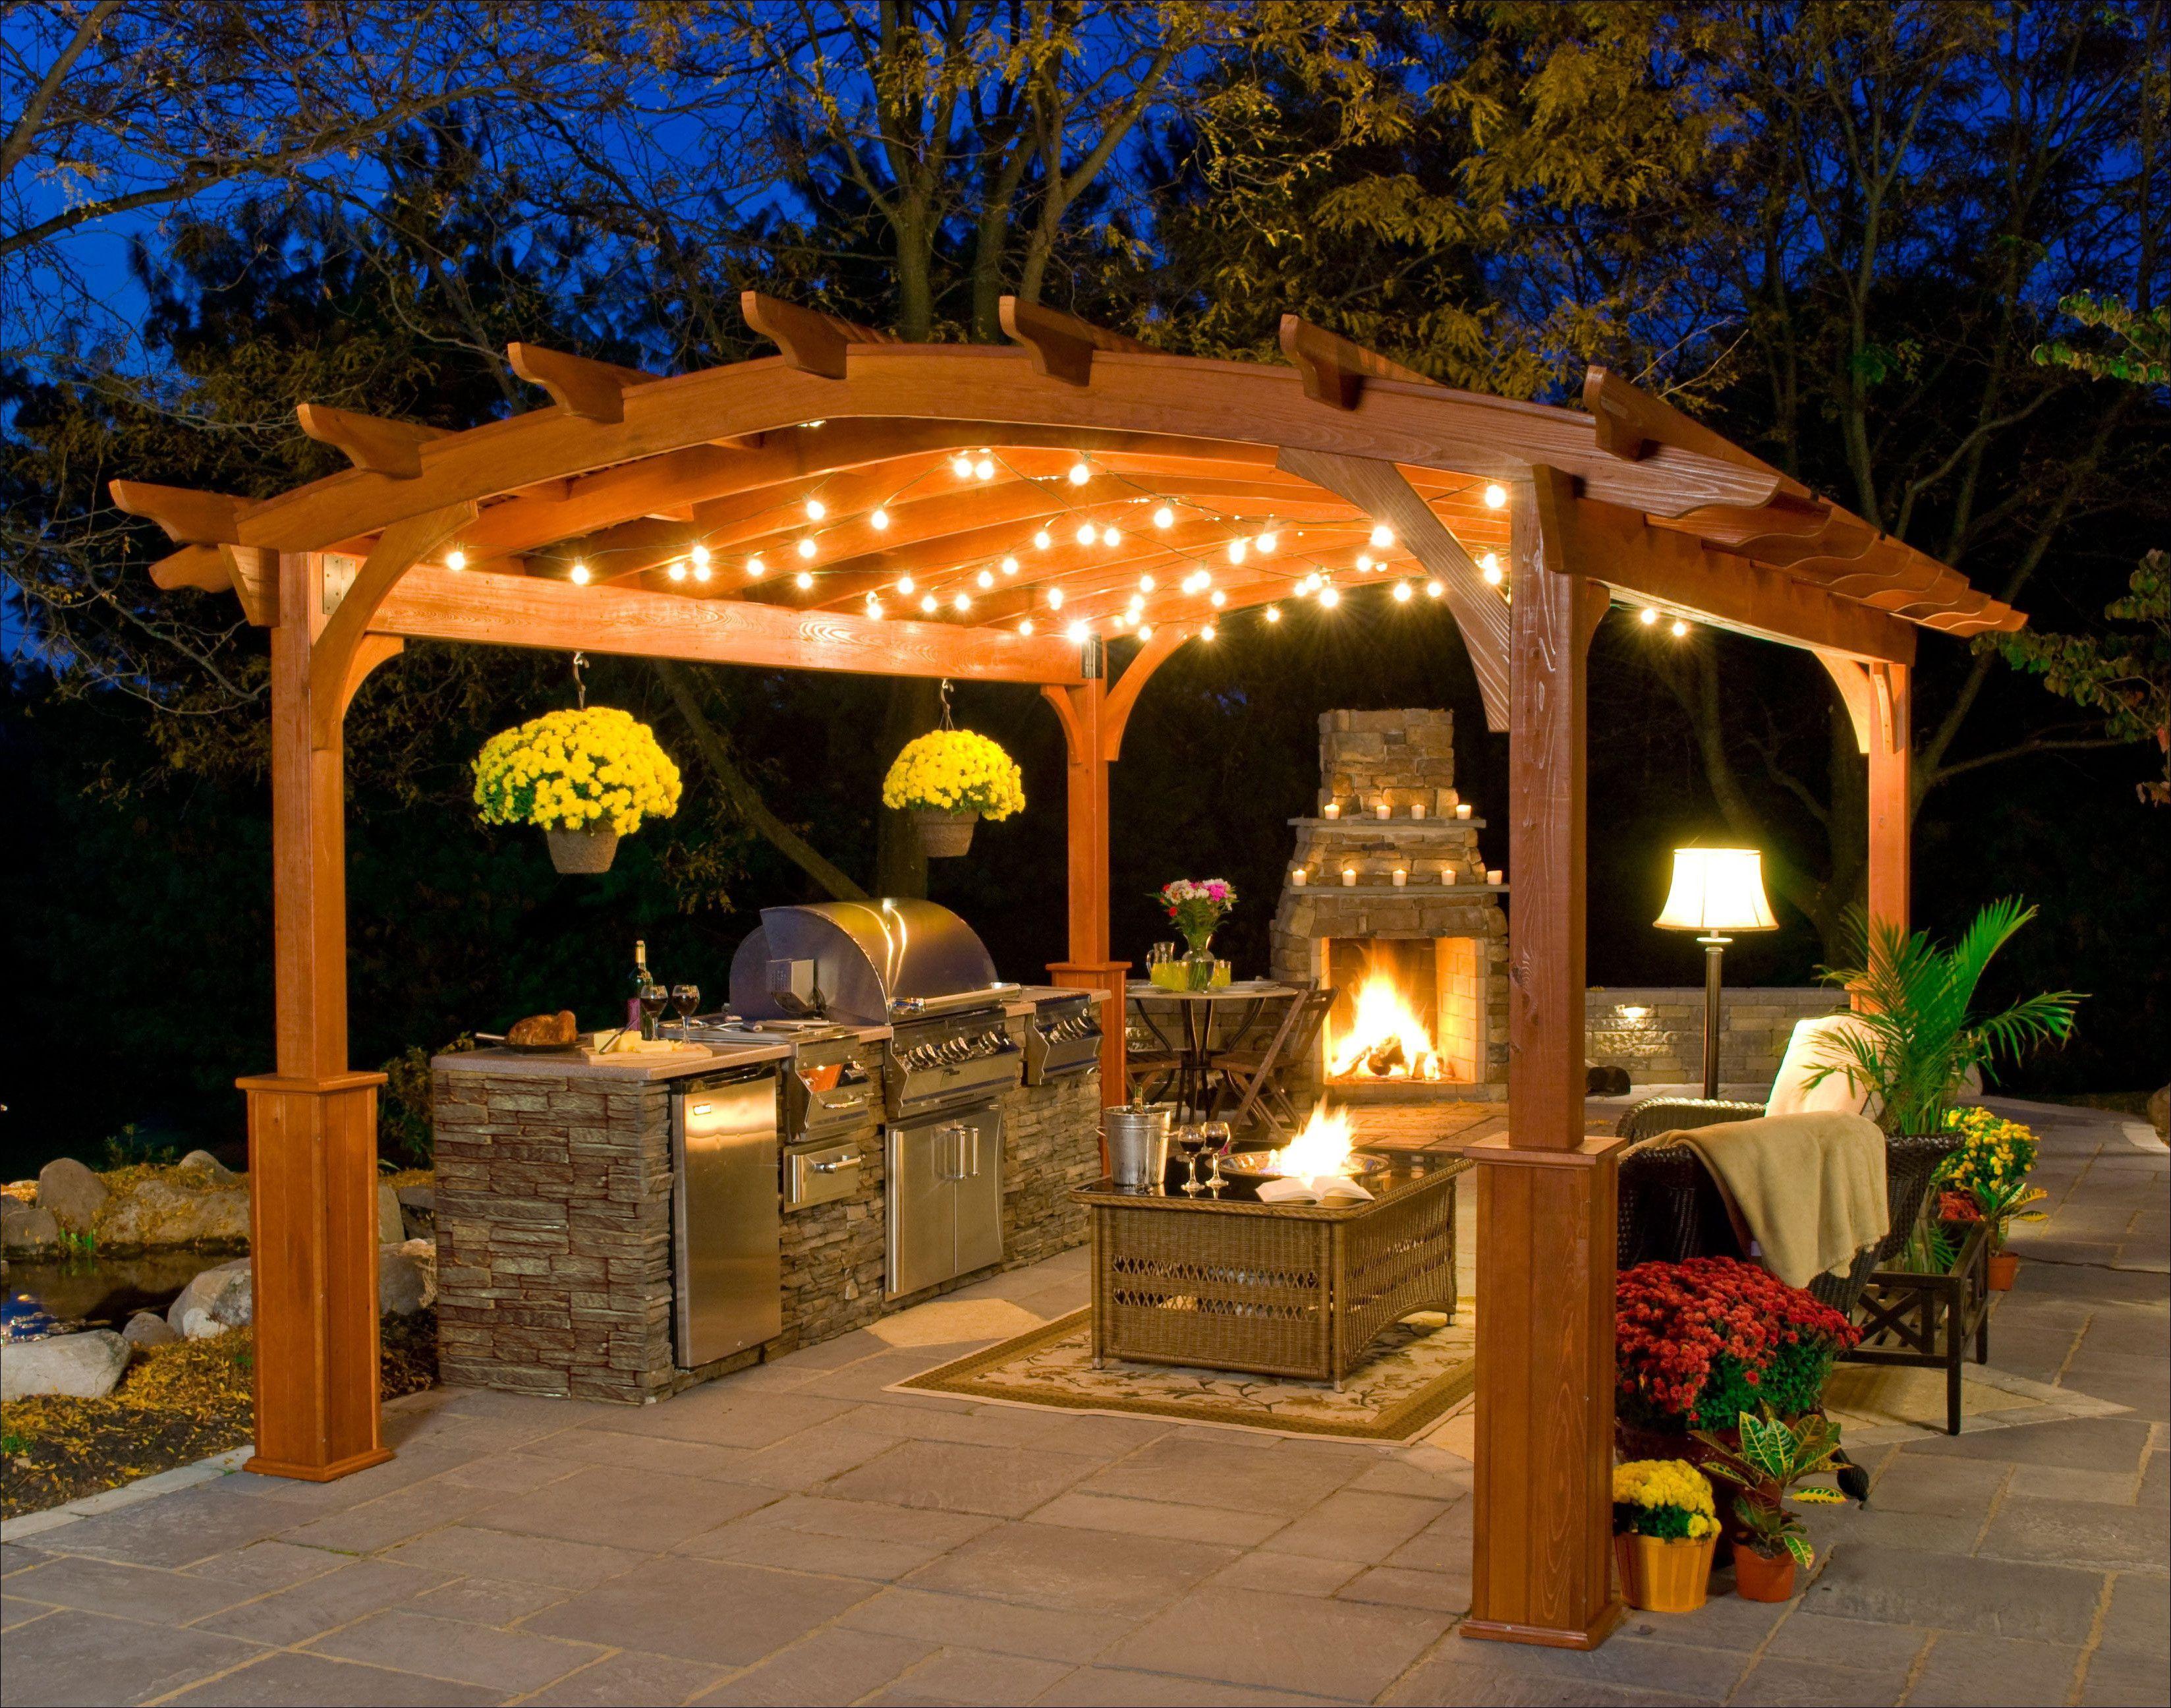 Custom Design Landscape Arbor Gazebo Fire Pit Outdoor Pergola Recettemoussechocolat Gazebo Lighting Outdoor Fireplace Designs Outdoor Gazebos